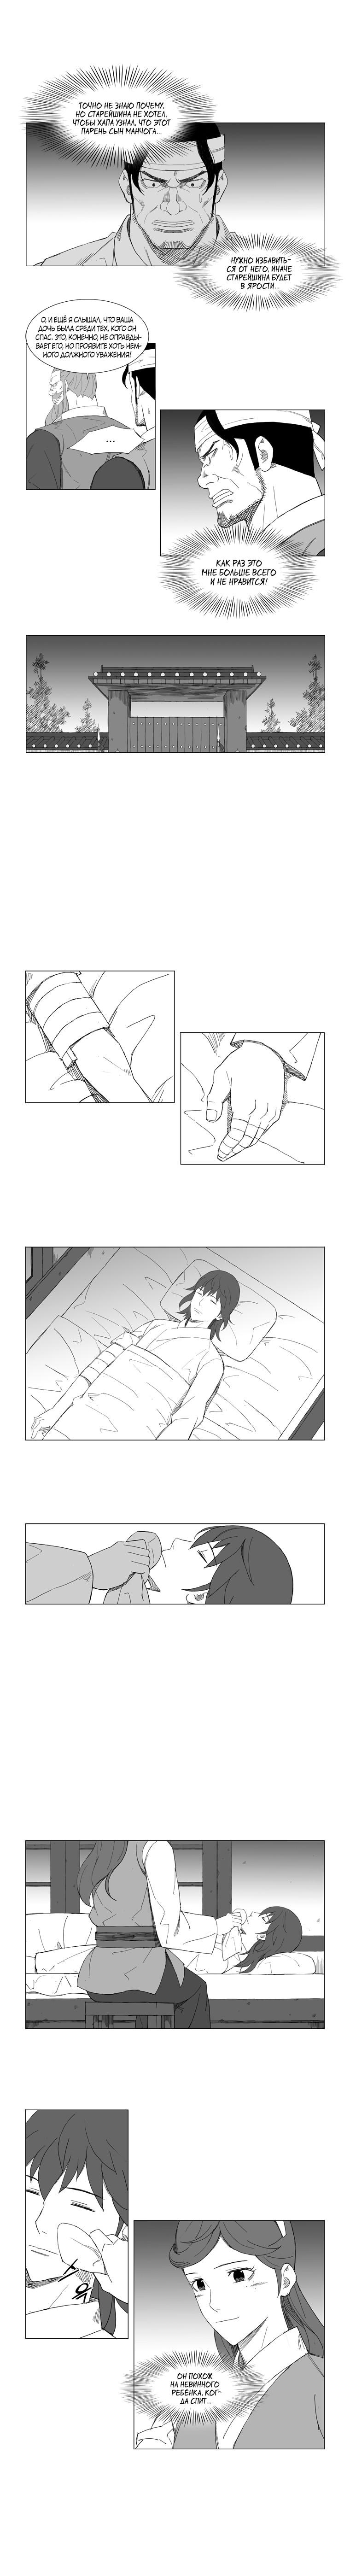 https://r1.ninemanga.com/comics/pic2/39/28263/331930/1502975992860.jpg Page 3